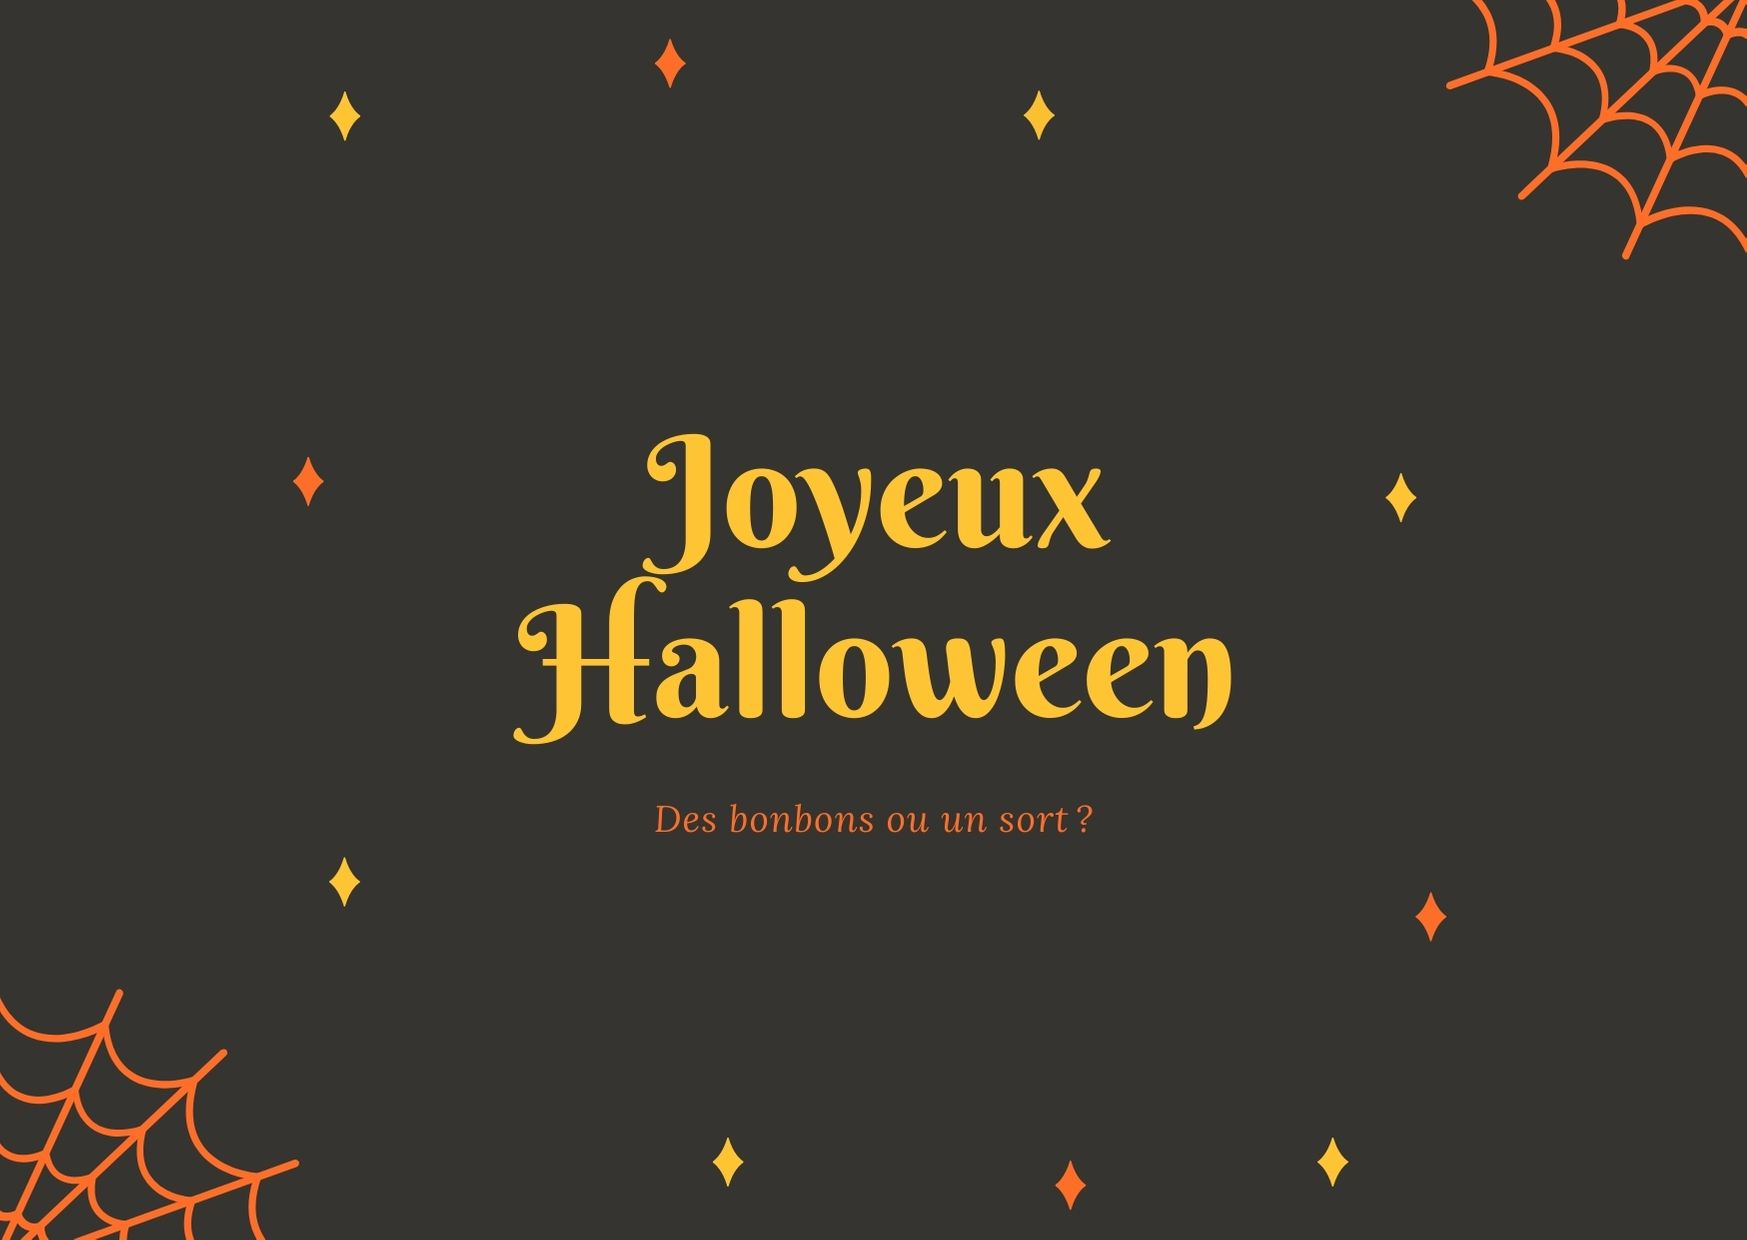 Joyeux Halloween carte